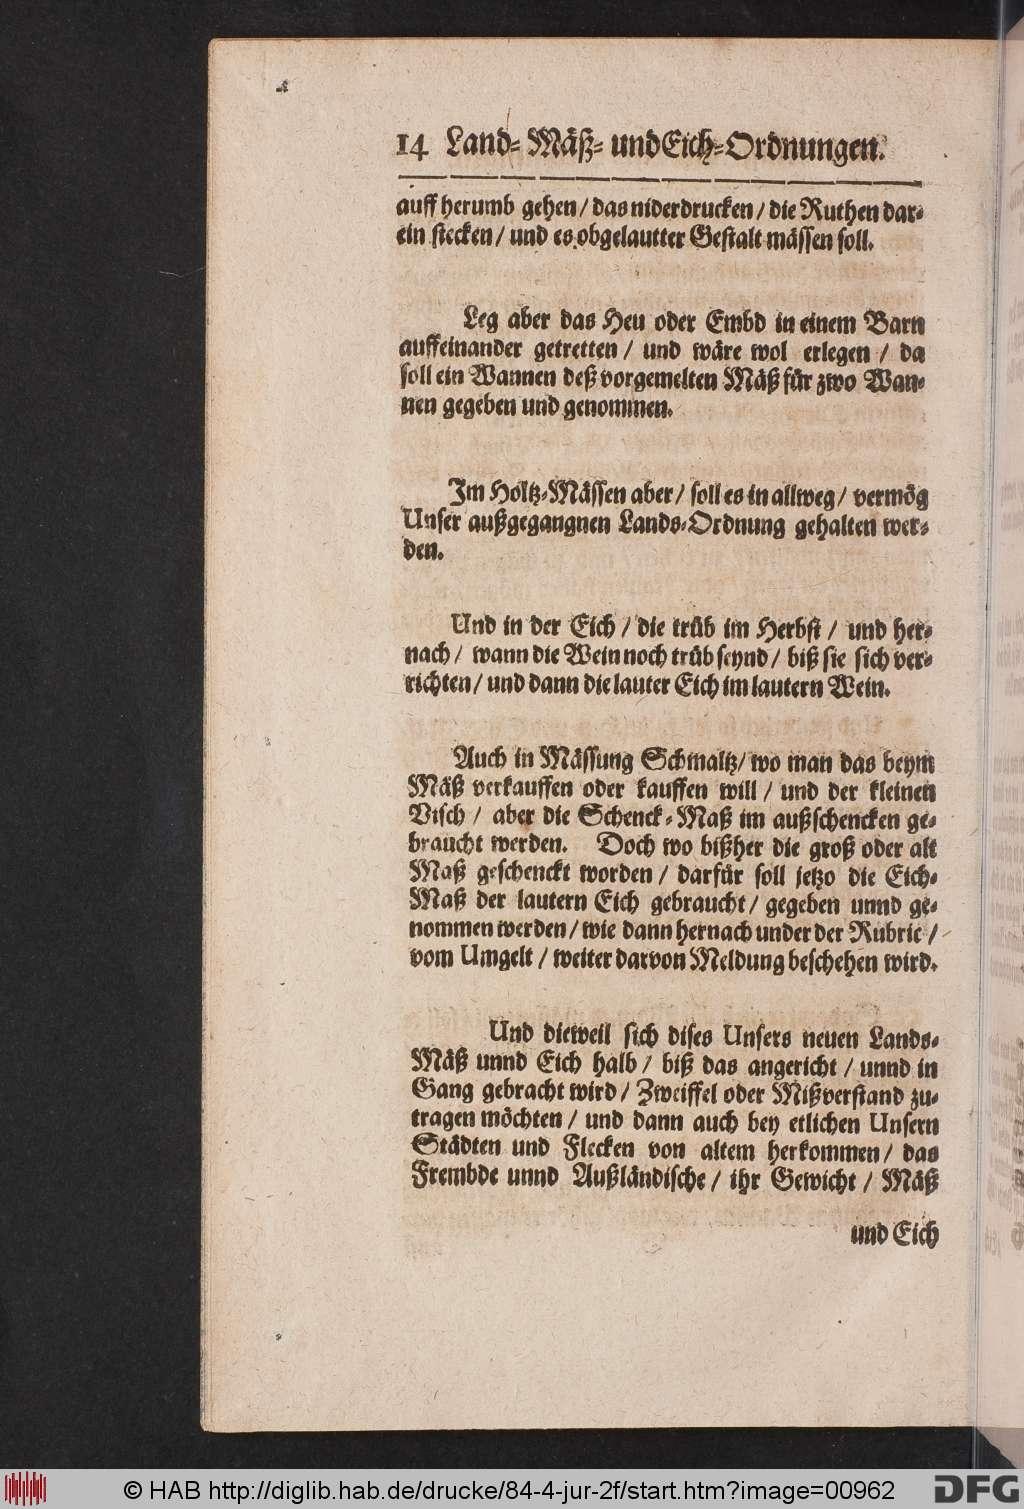 https://diglib.hab.de/drucke/84-4-jur-2f/00962.jpg